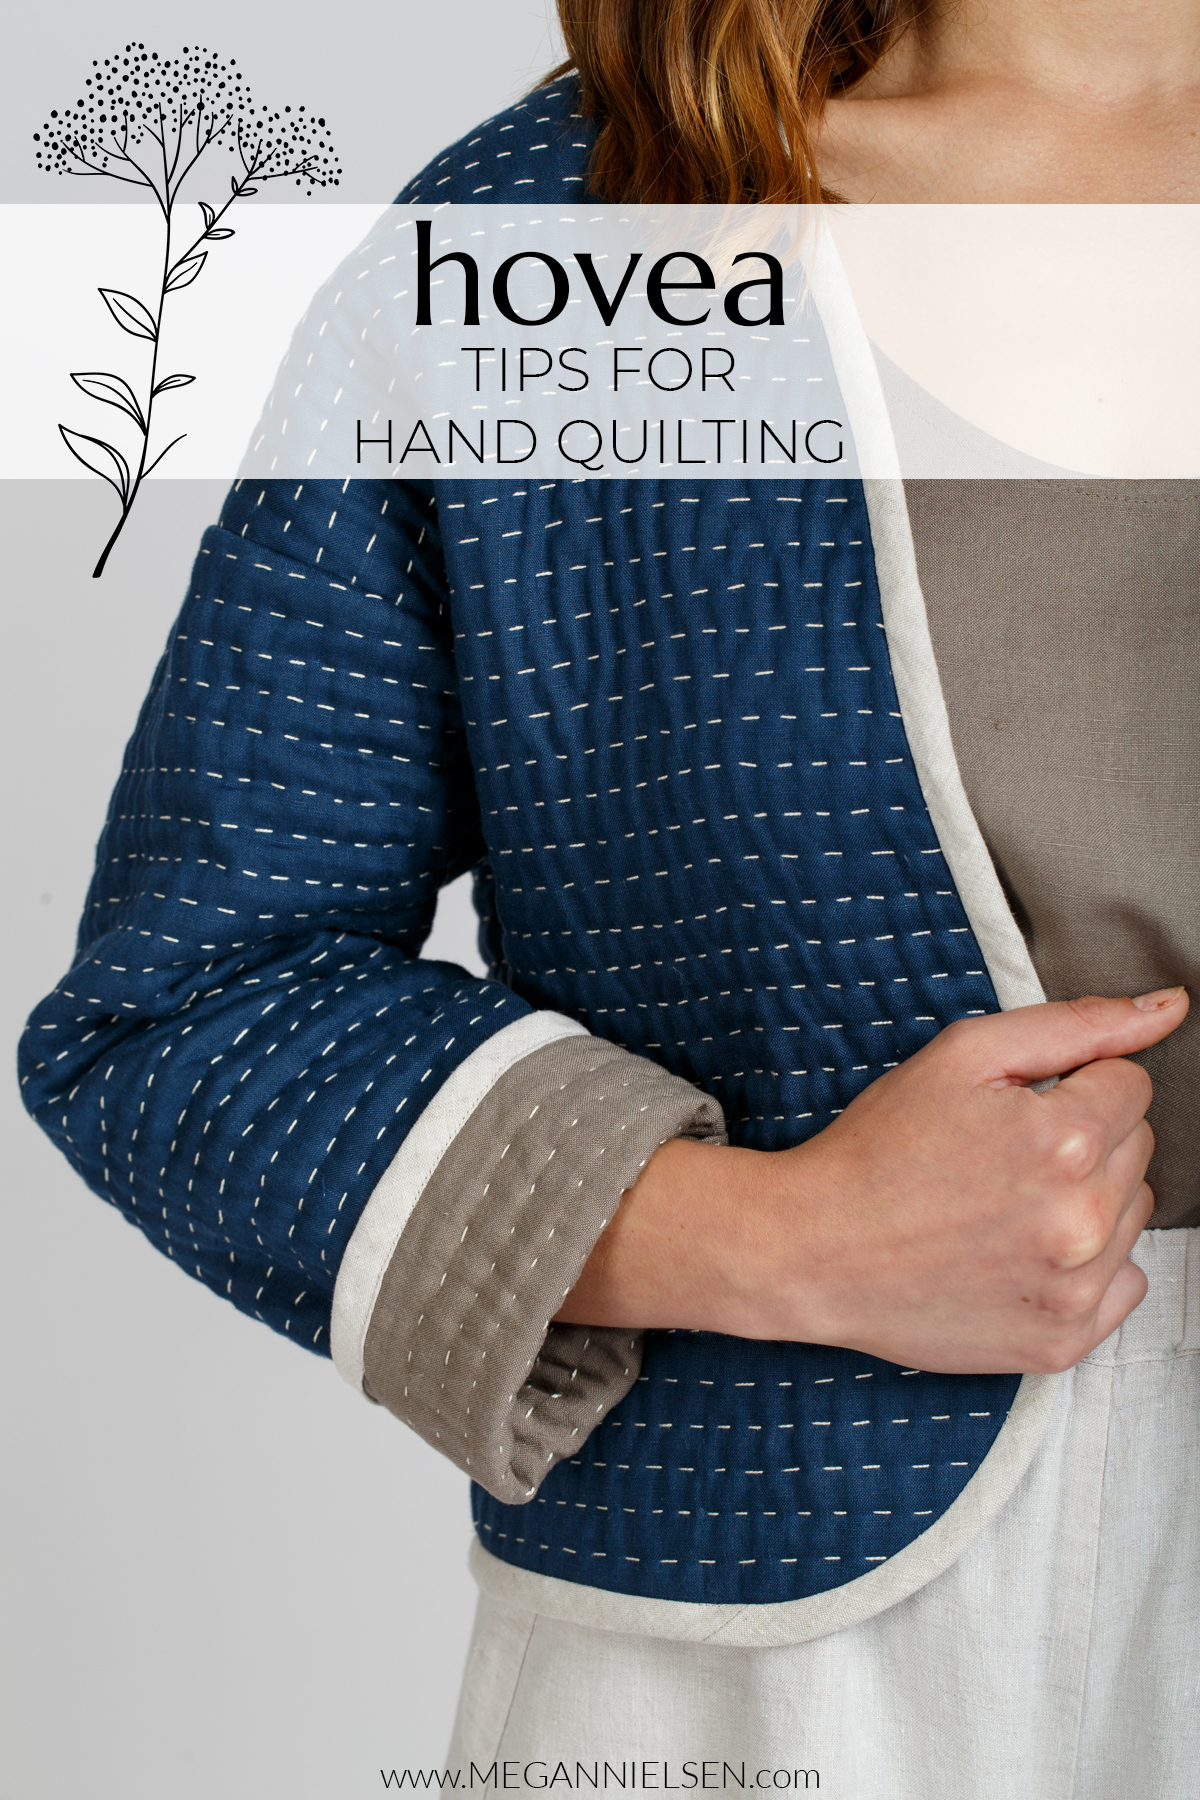 Tips for Hand Quilting the Hovea Jacket | Megan Nielsen Blog